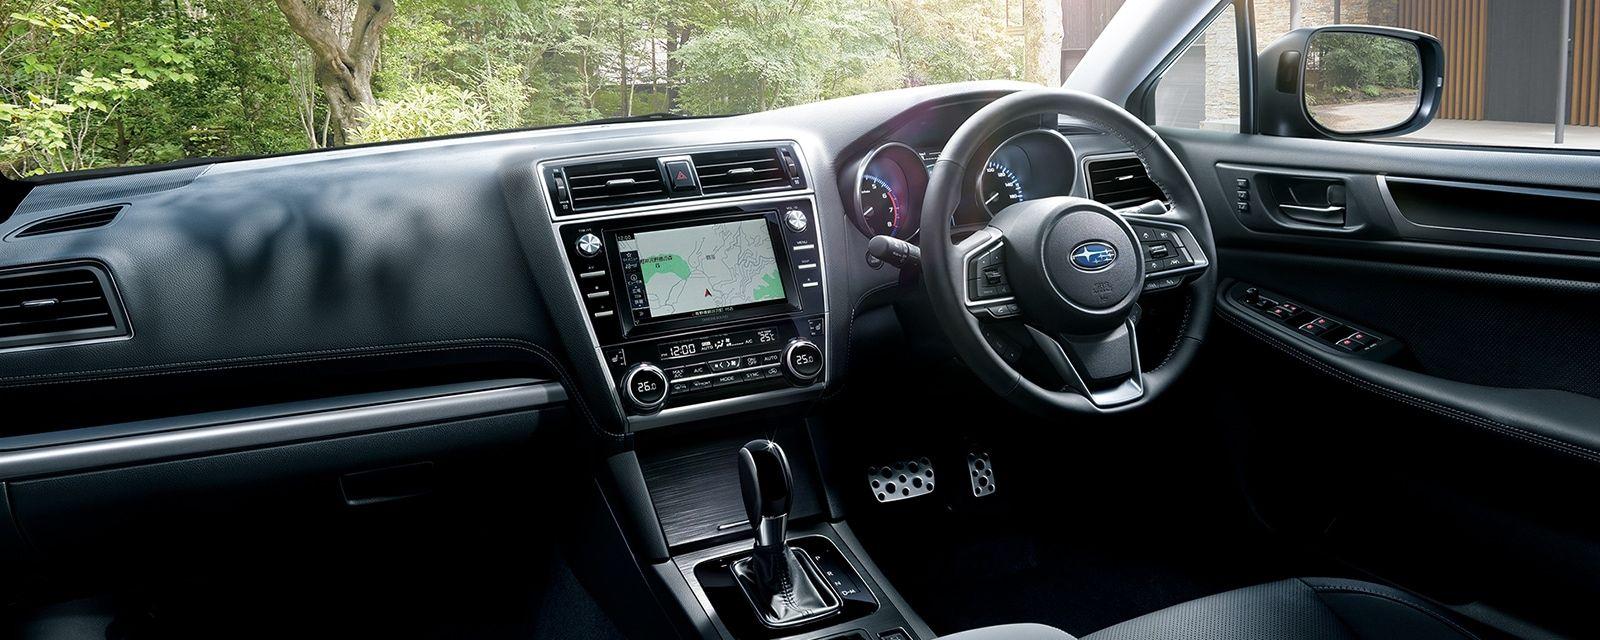 Full Comparison 2019 Subaru Forester vs Outback Pros and